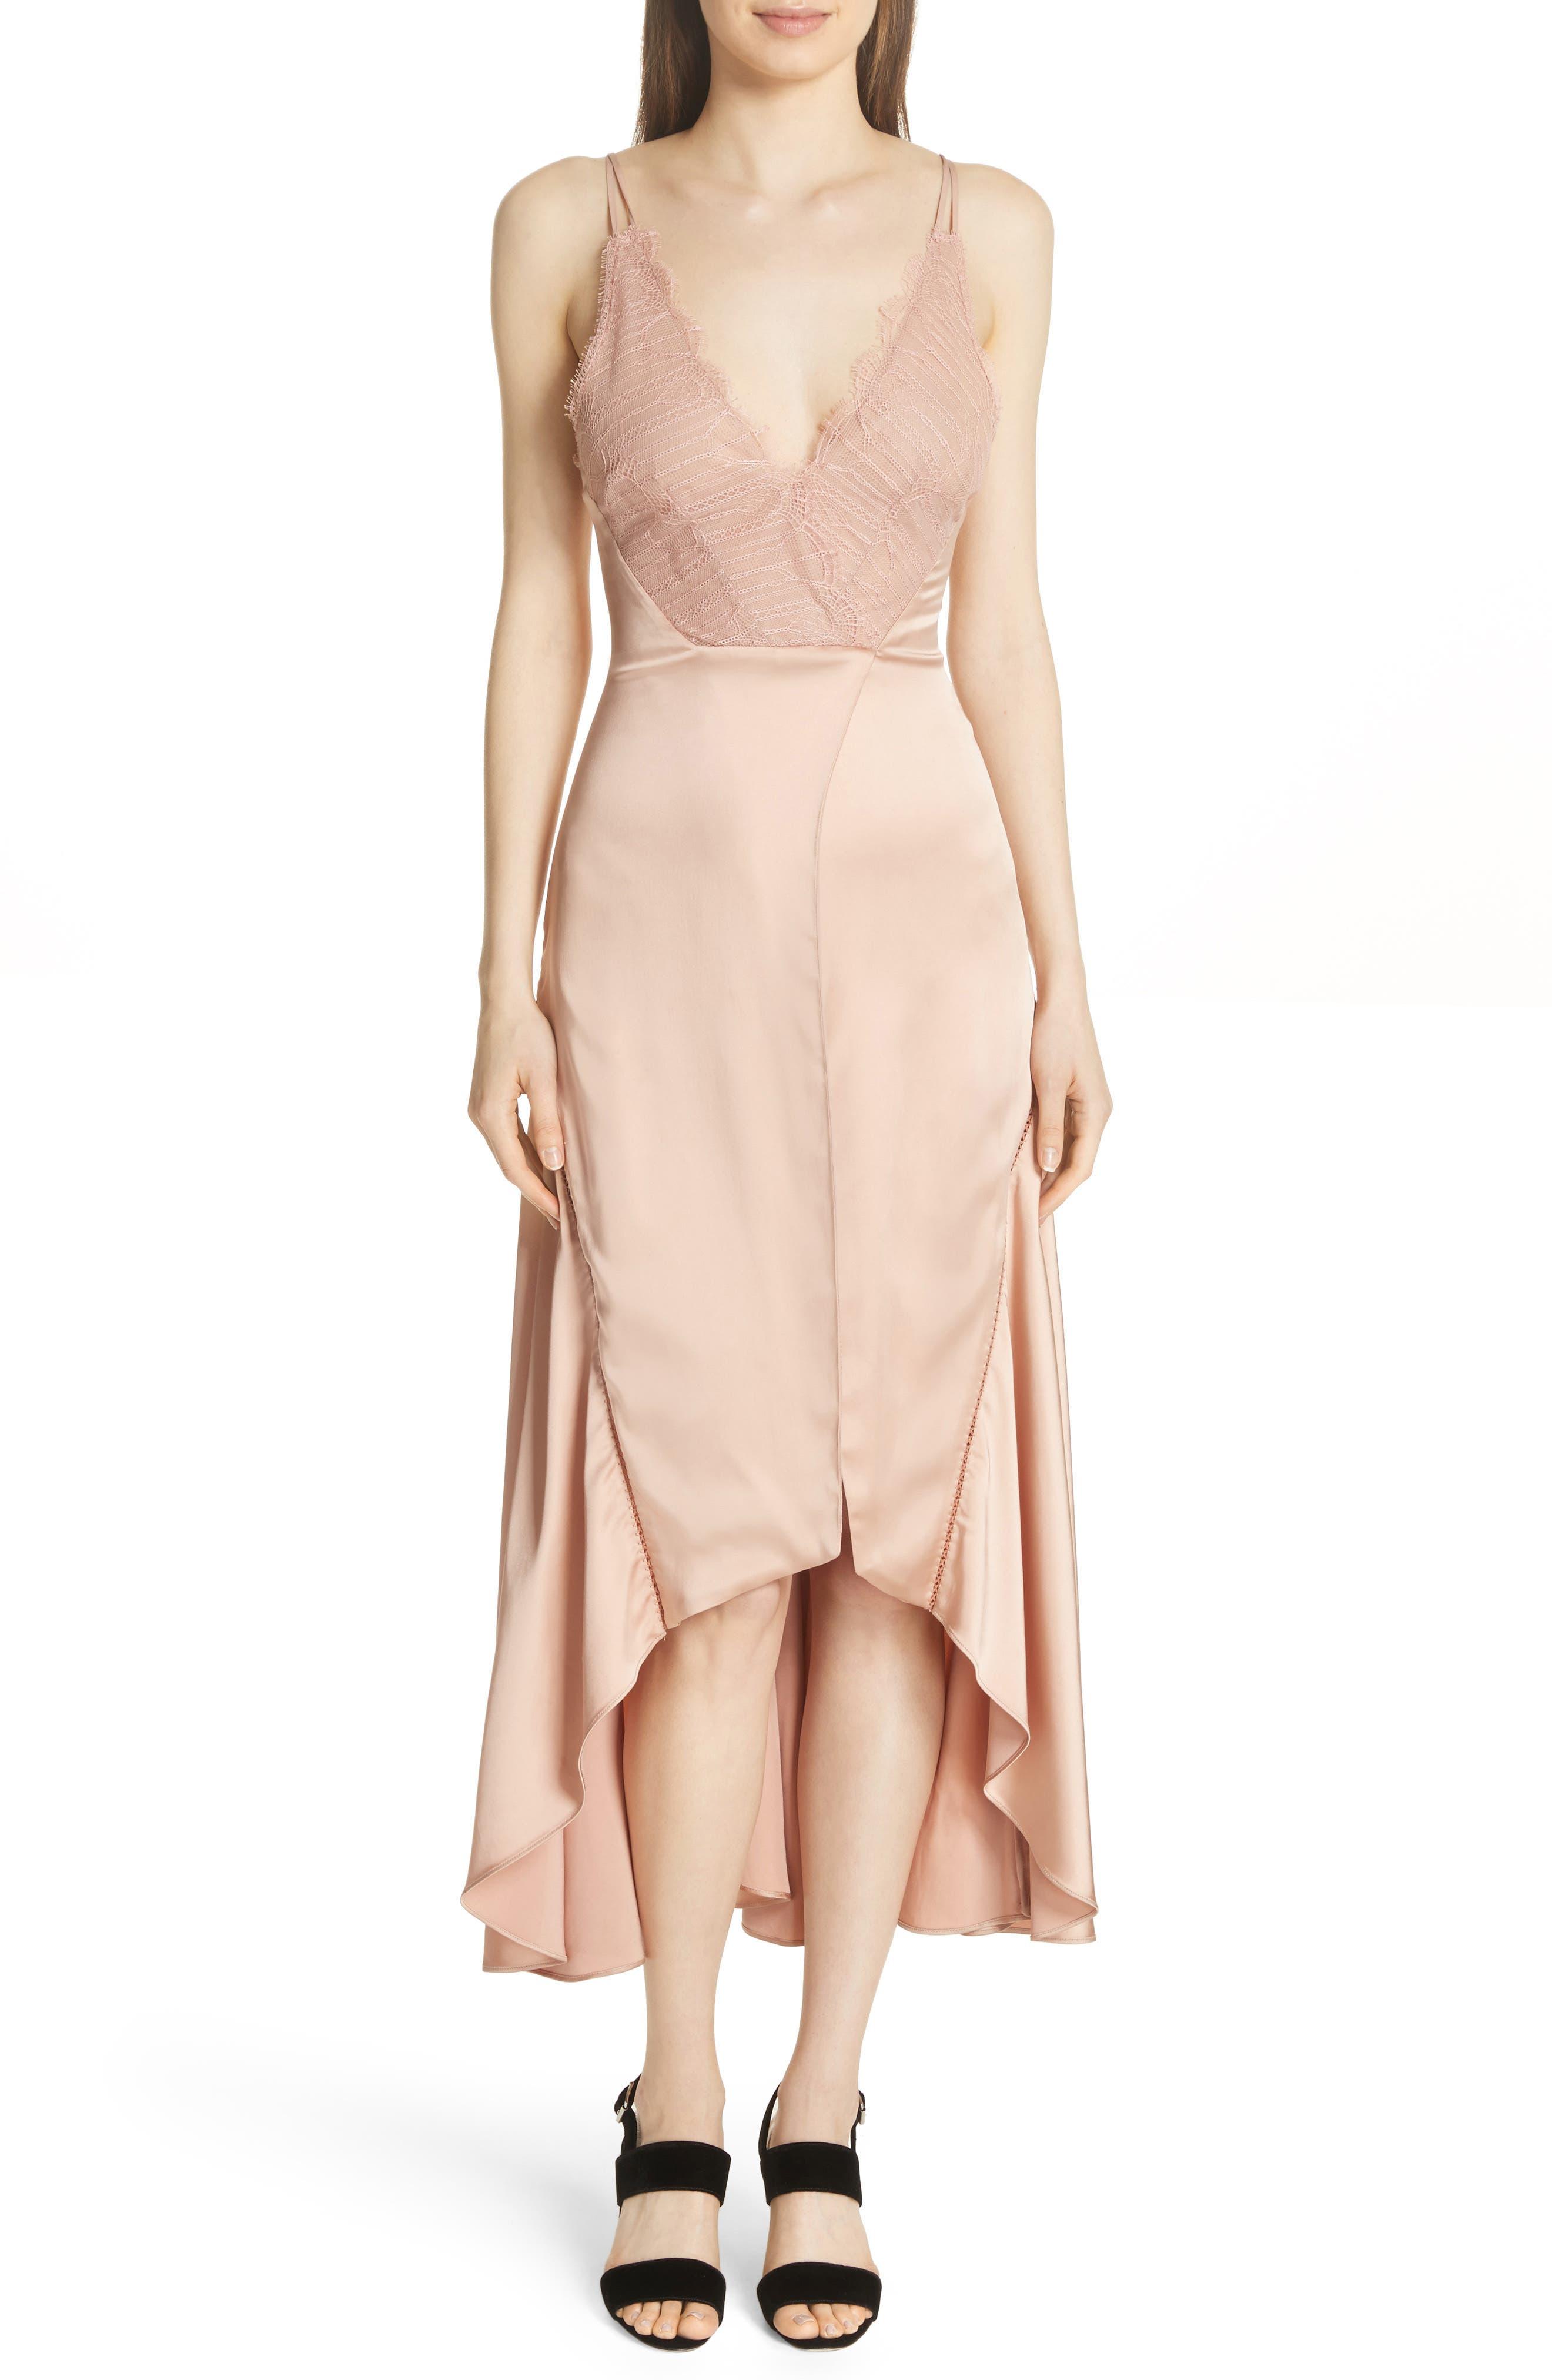 Jonathan Simkhai Mixed Trim Satin Handkerchief Dress